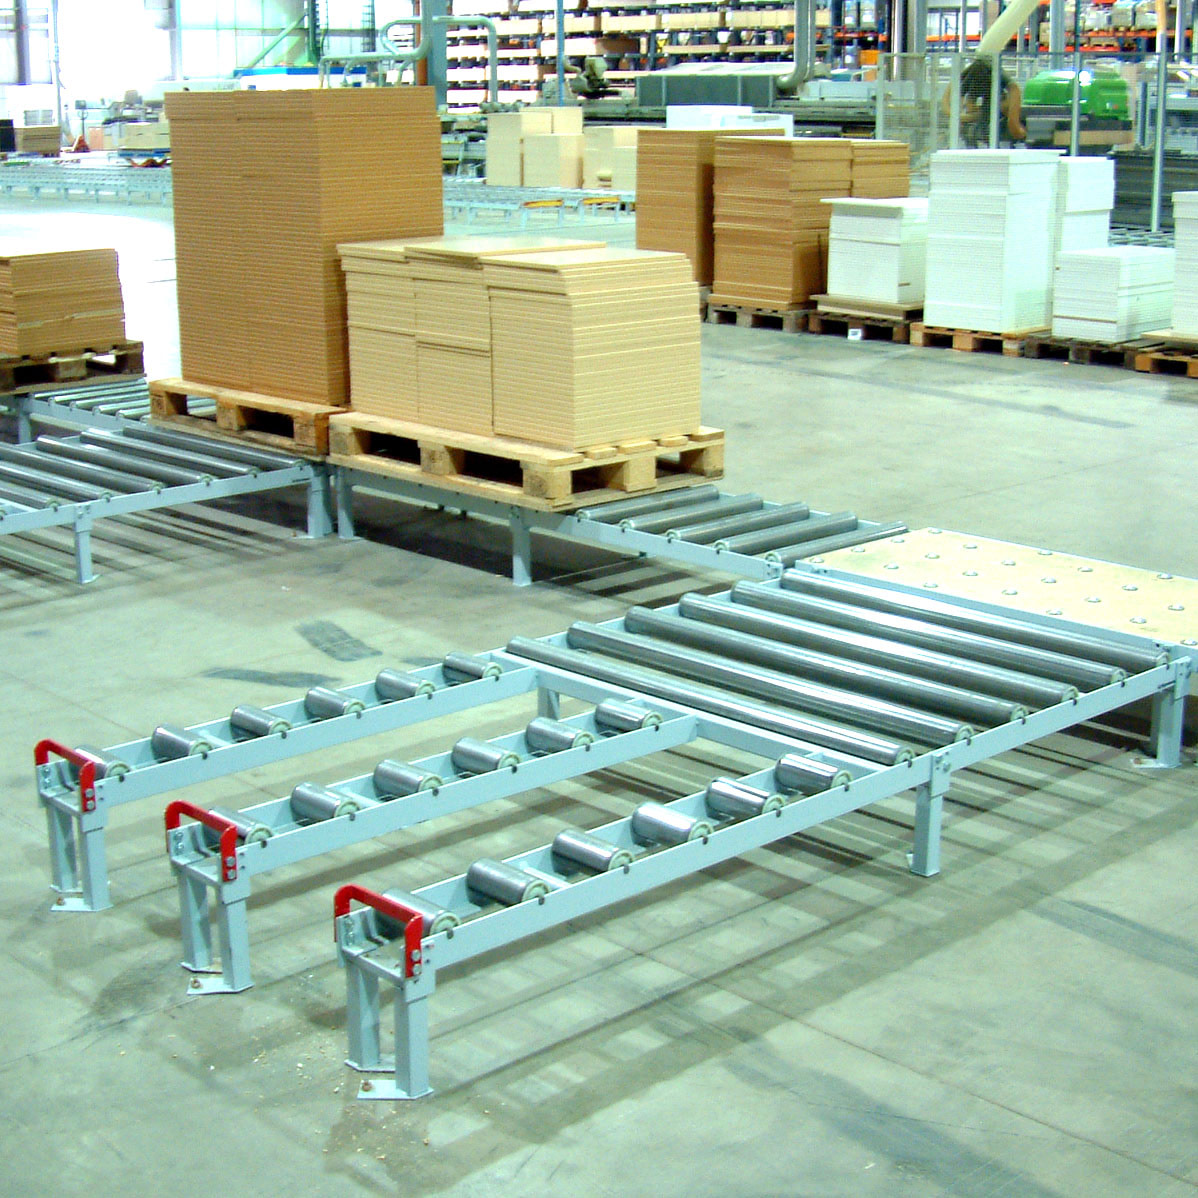 Udrevne rullebaner i møbelproduktion / Non-driven roller conveyors in furniture factory